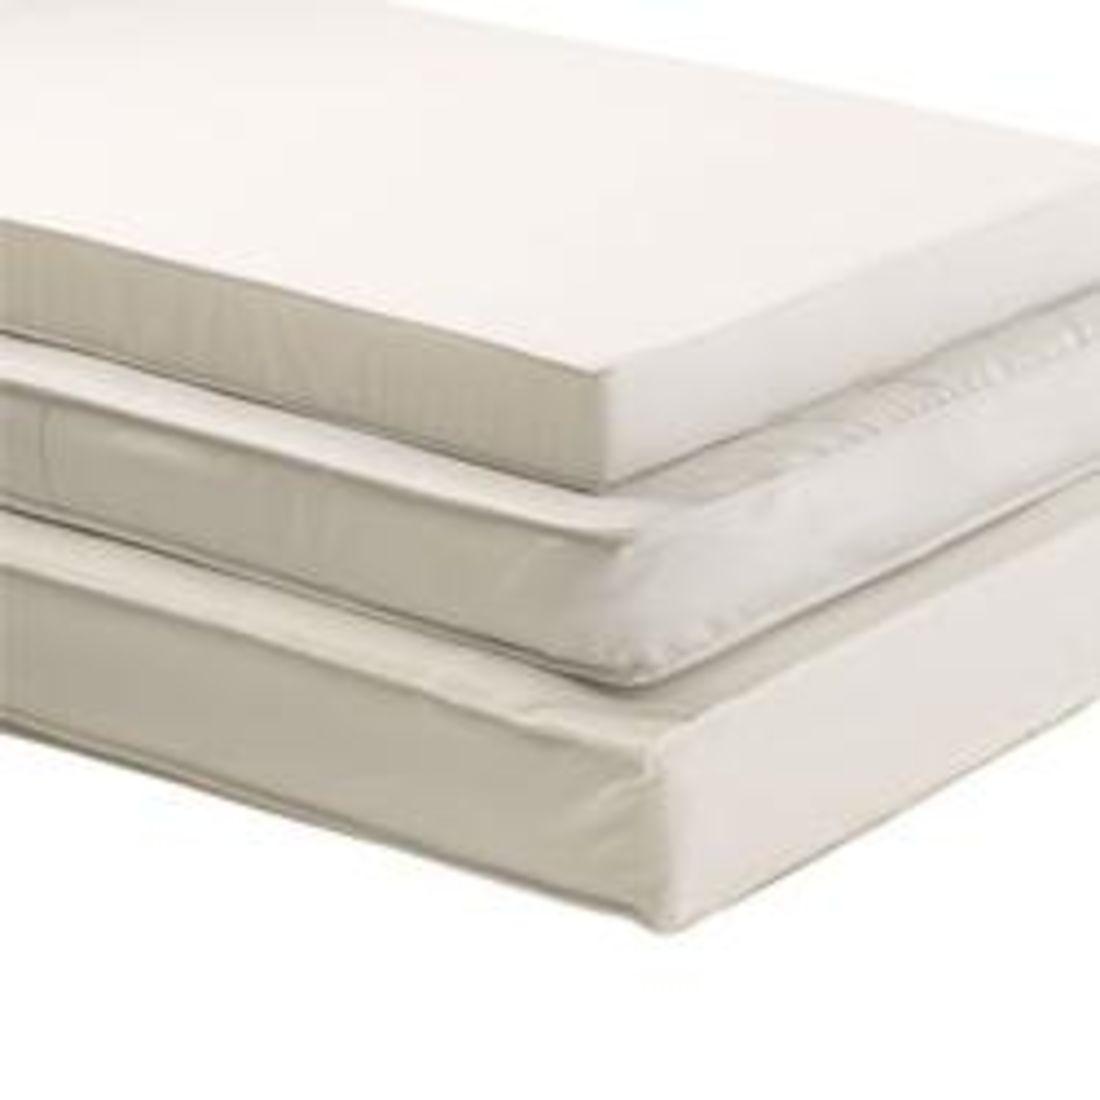 Odd size mattress Baby Mattresses line